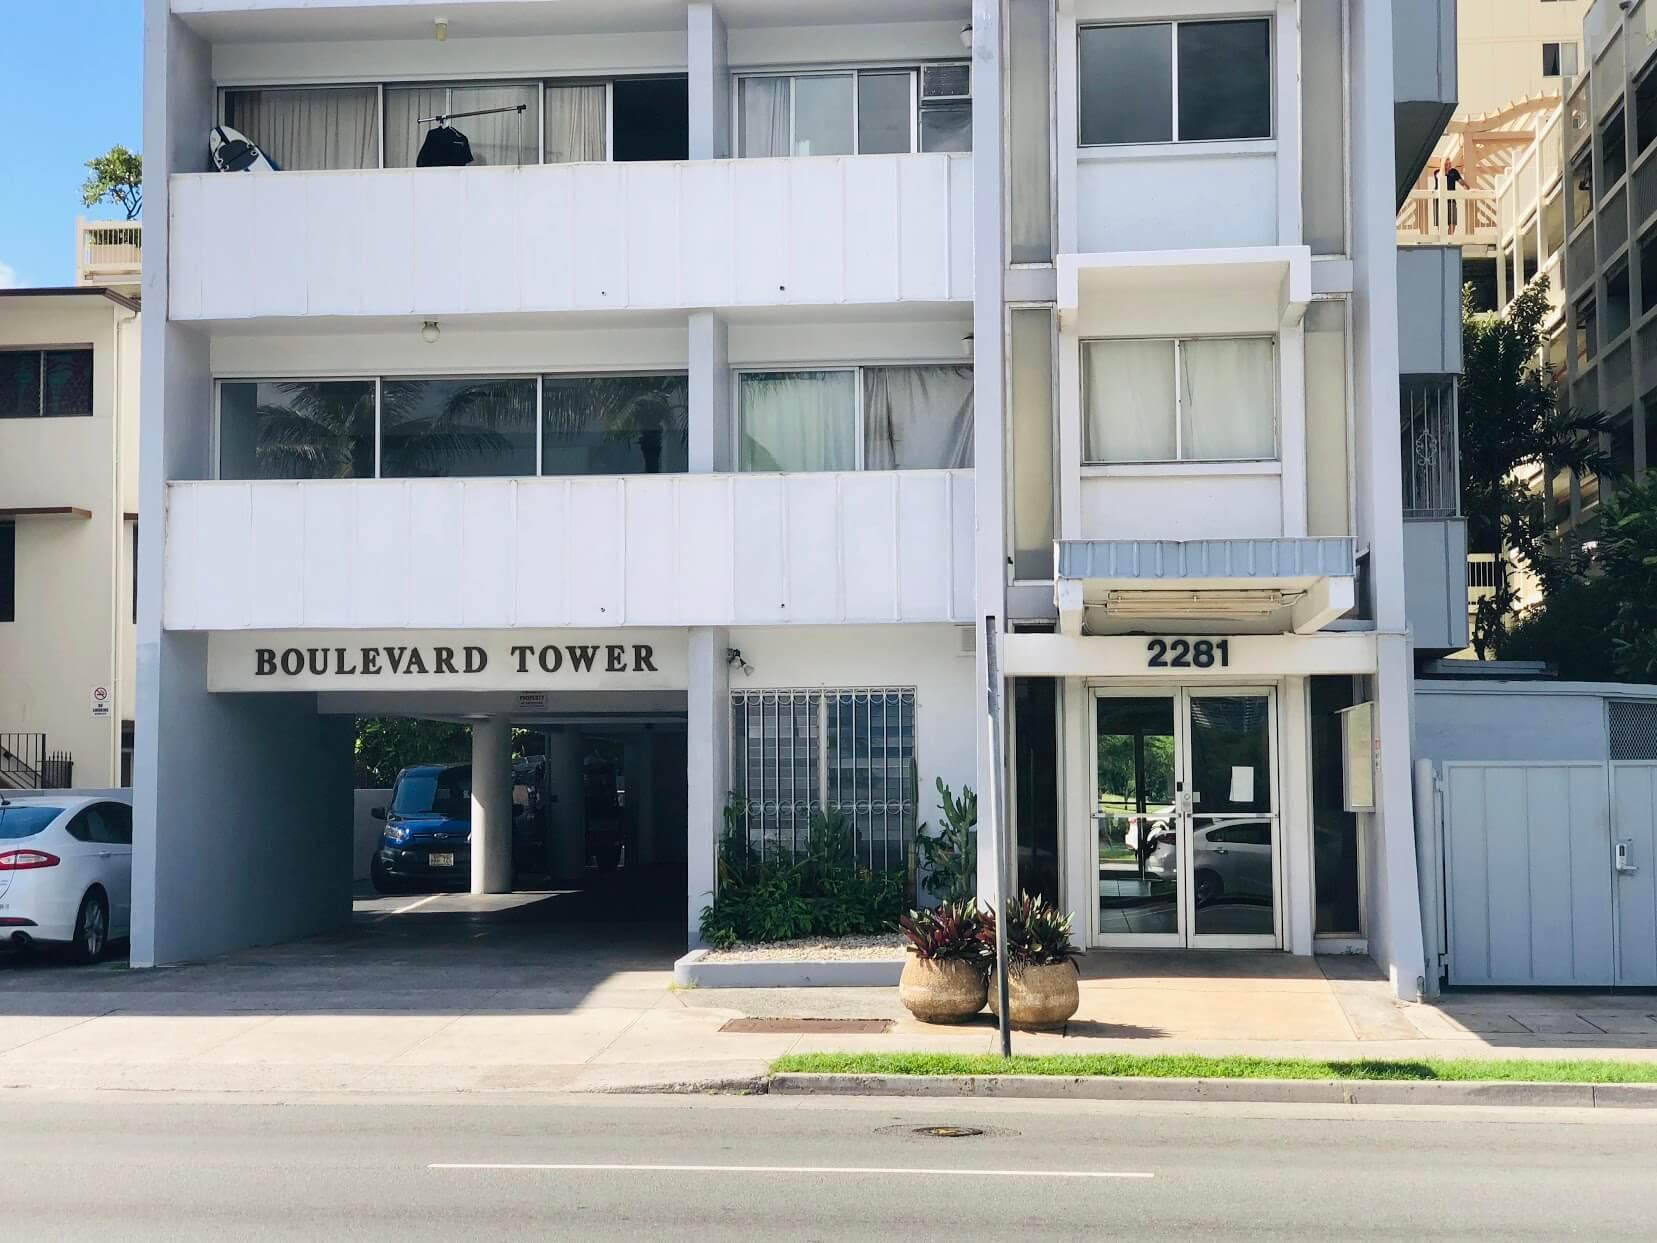 Boulevard Towermの外観